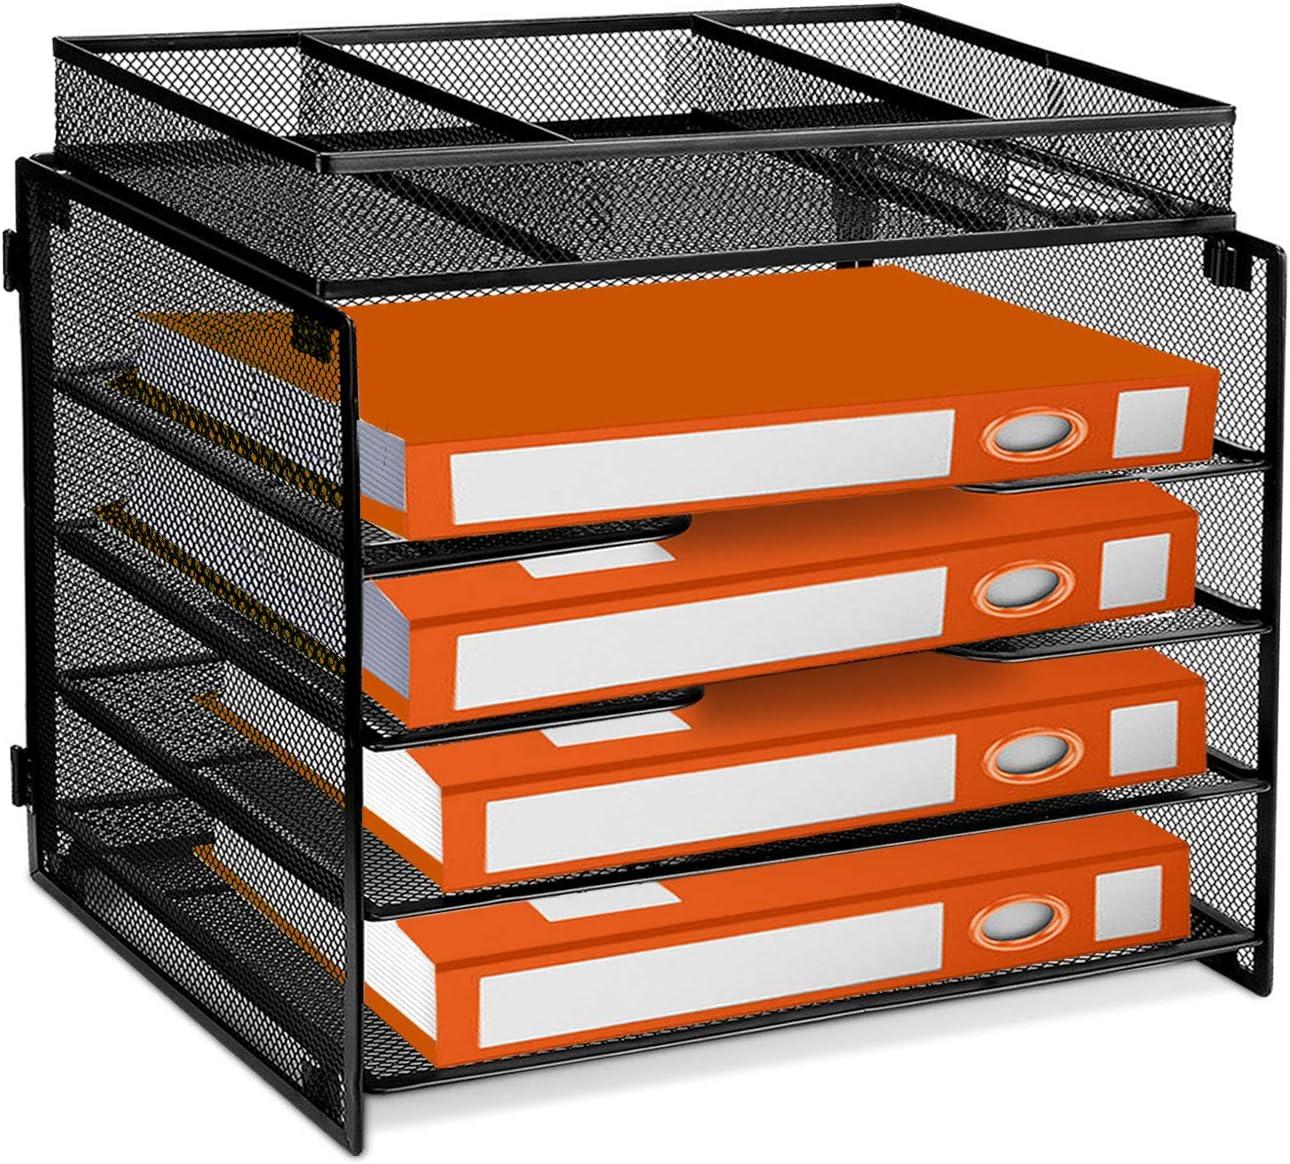 ProAid Desk Letter Tray Organize, Mesh Desktop File Organizer with 48 Tier  Paper Size Shelves and a Sorter for Desk Accessories, Black